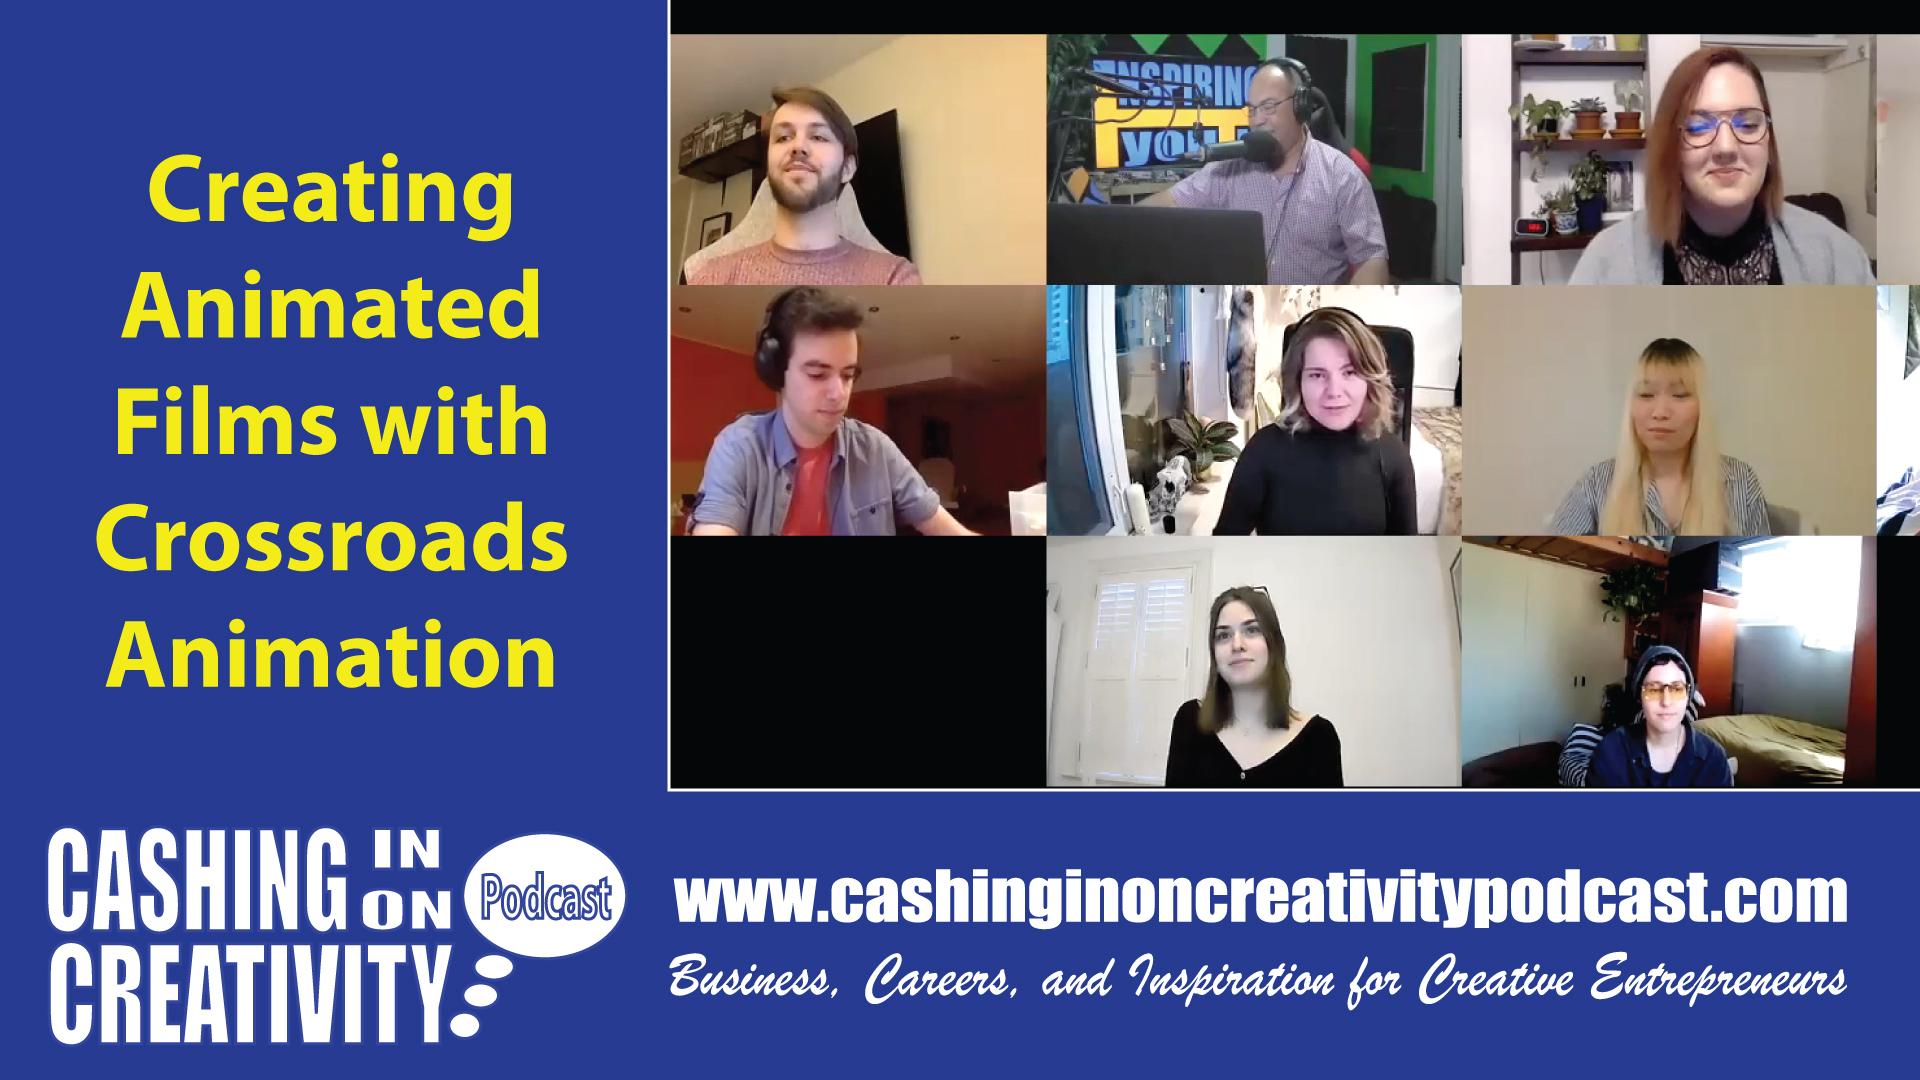 CC248 Creating Animation with Crossroads Studios